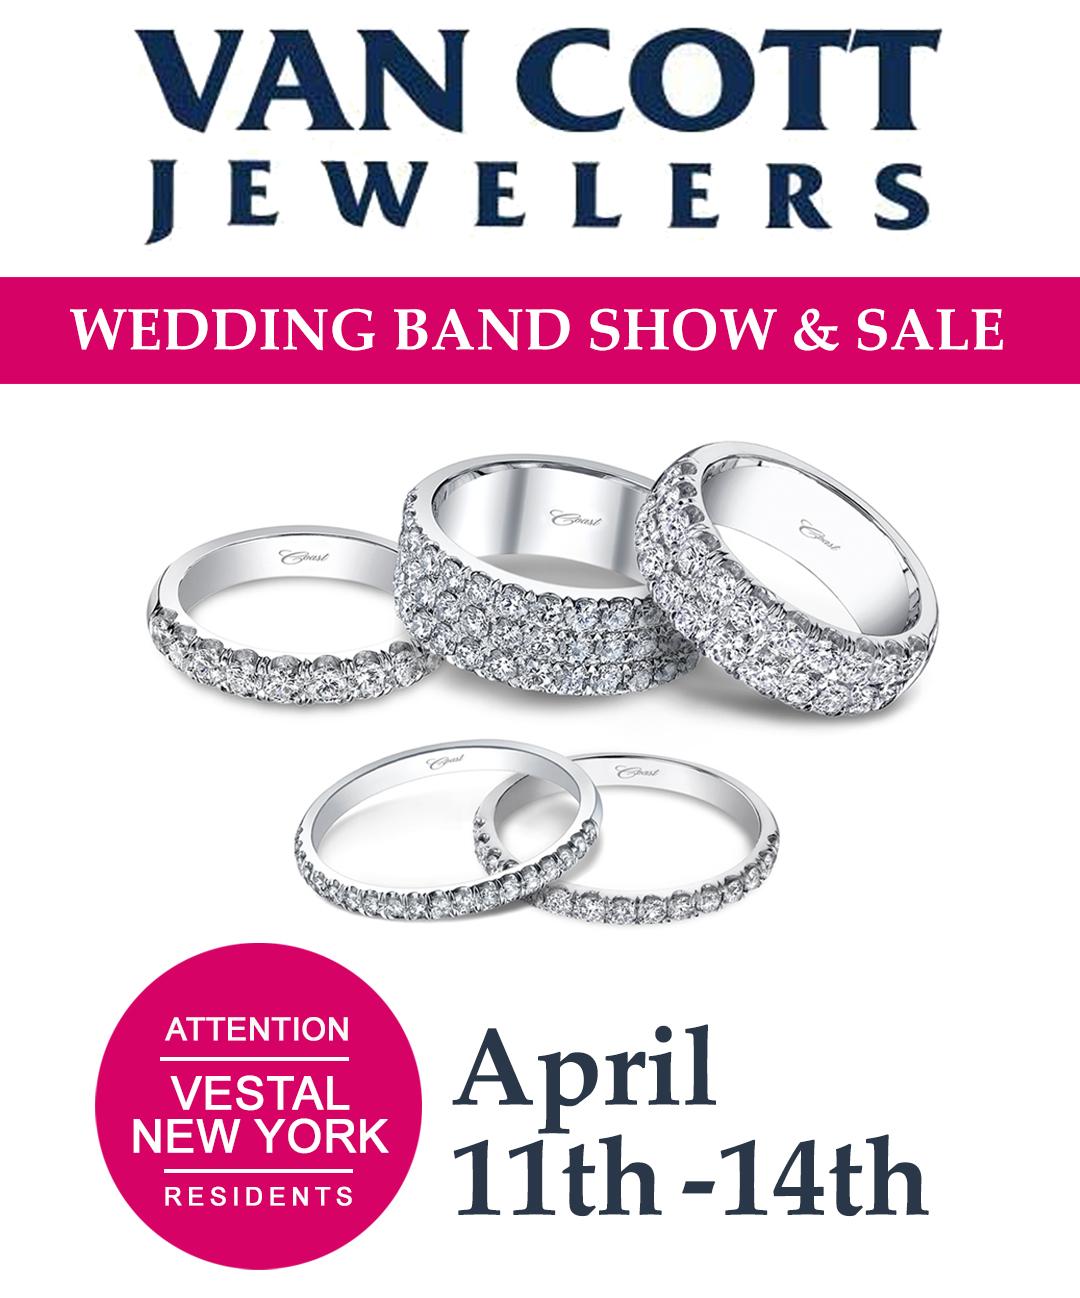 Van Cott Jewelers Wedding Band Show and Sale – Featuring Coast Diamond